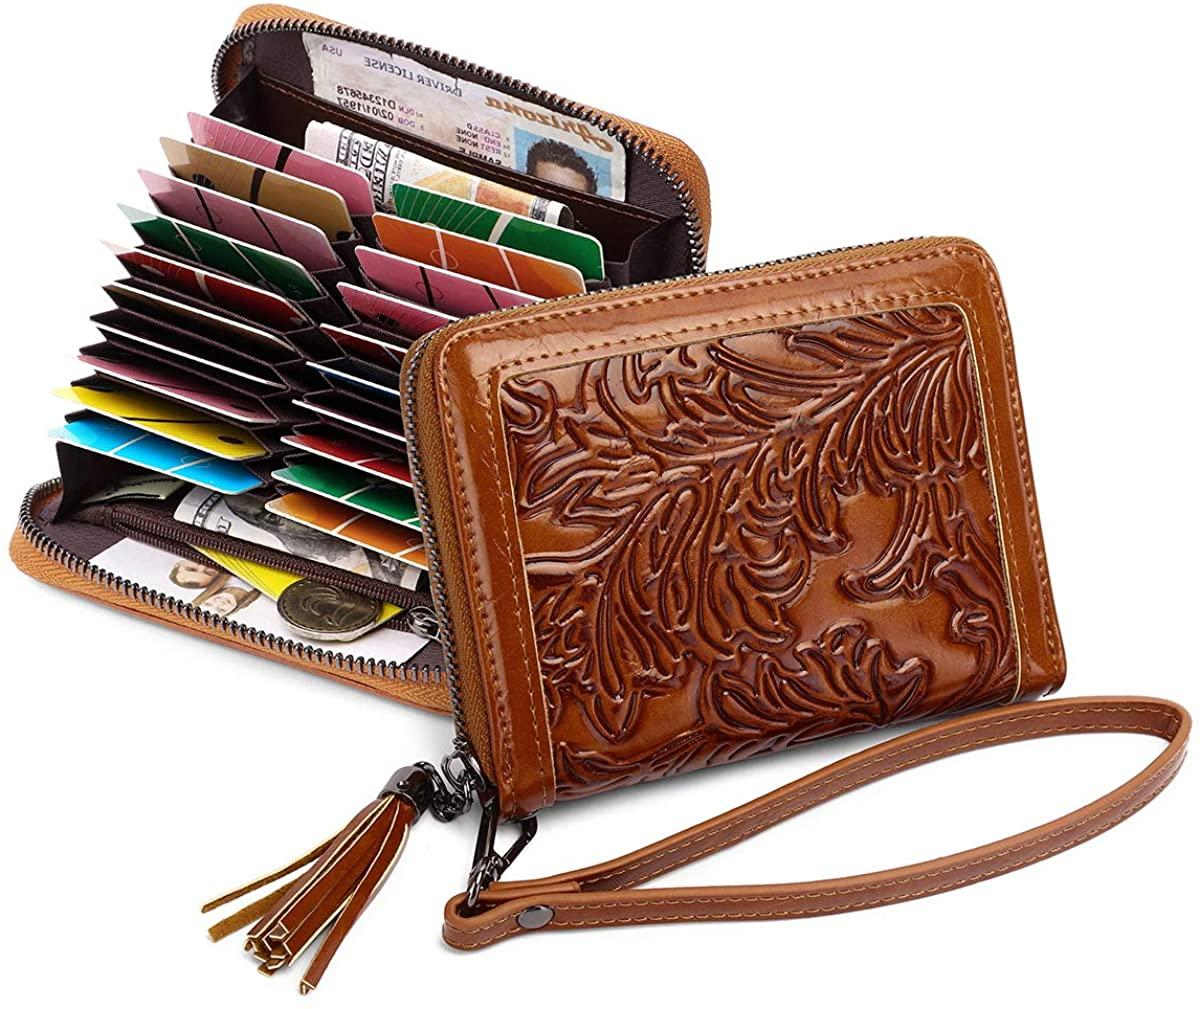 Credit Card Case Holder for Women RFID Blocking Embossed Ladies Wallet 20 Slots Coin Purse Zip Around Tassels 189-2